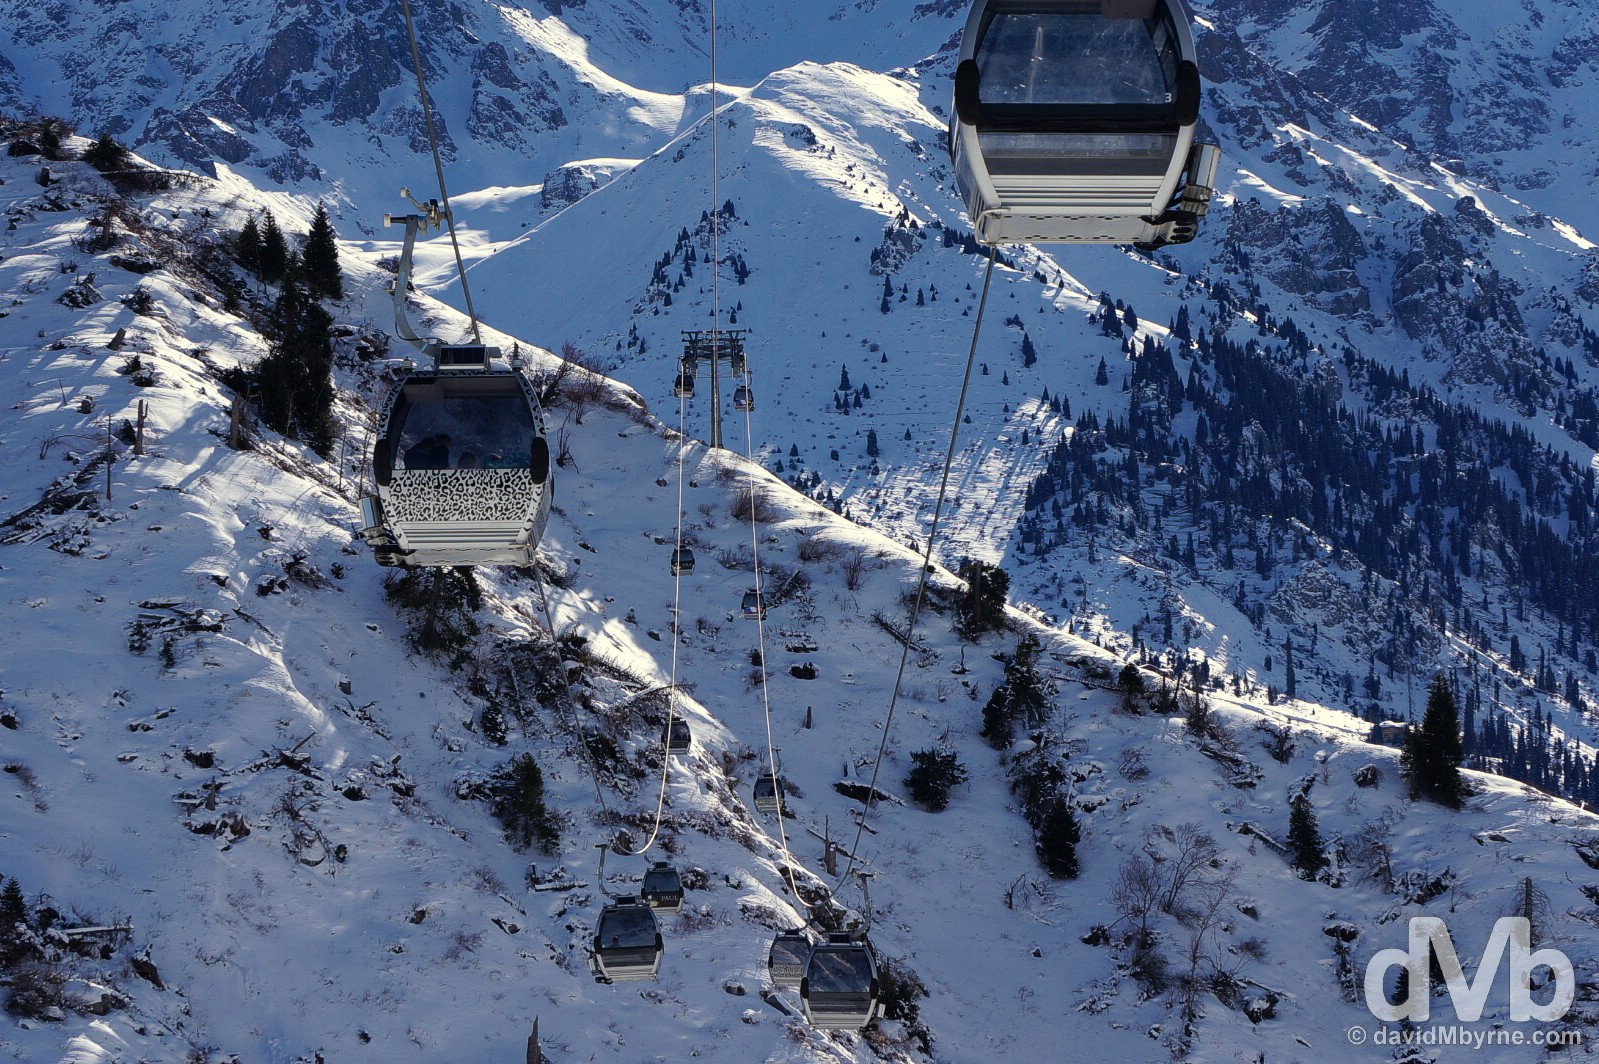 Gondolas of the Shymbulak Ski Resort cable car system on the slopes of the Zailiysky Alatau range in southern Kazakhstan. February 14, 2015.